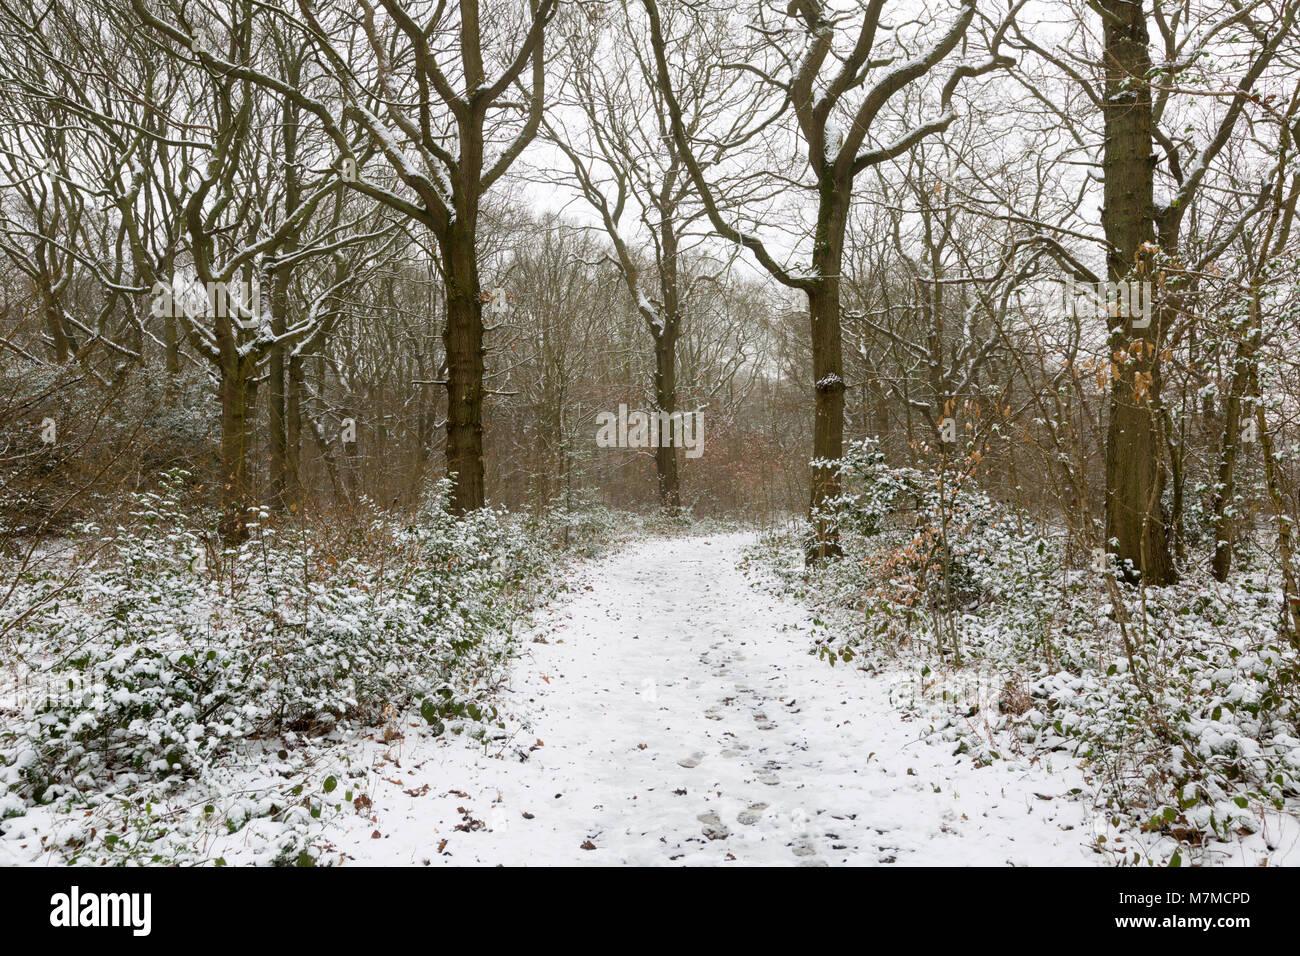 Bonito bosque, parte del antiguo bosque de la Blean, en nieve, Dunkerque, Faversham, Kent Foto de stock